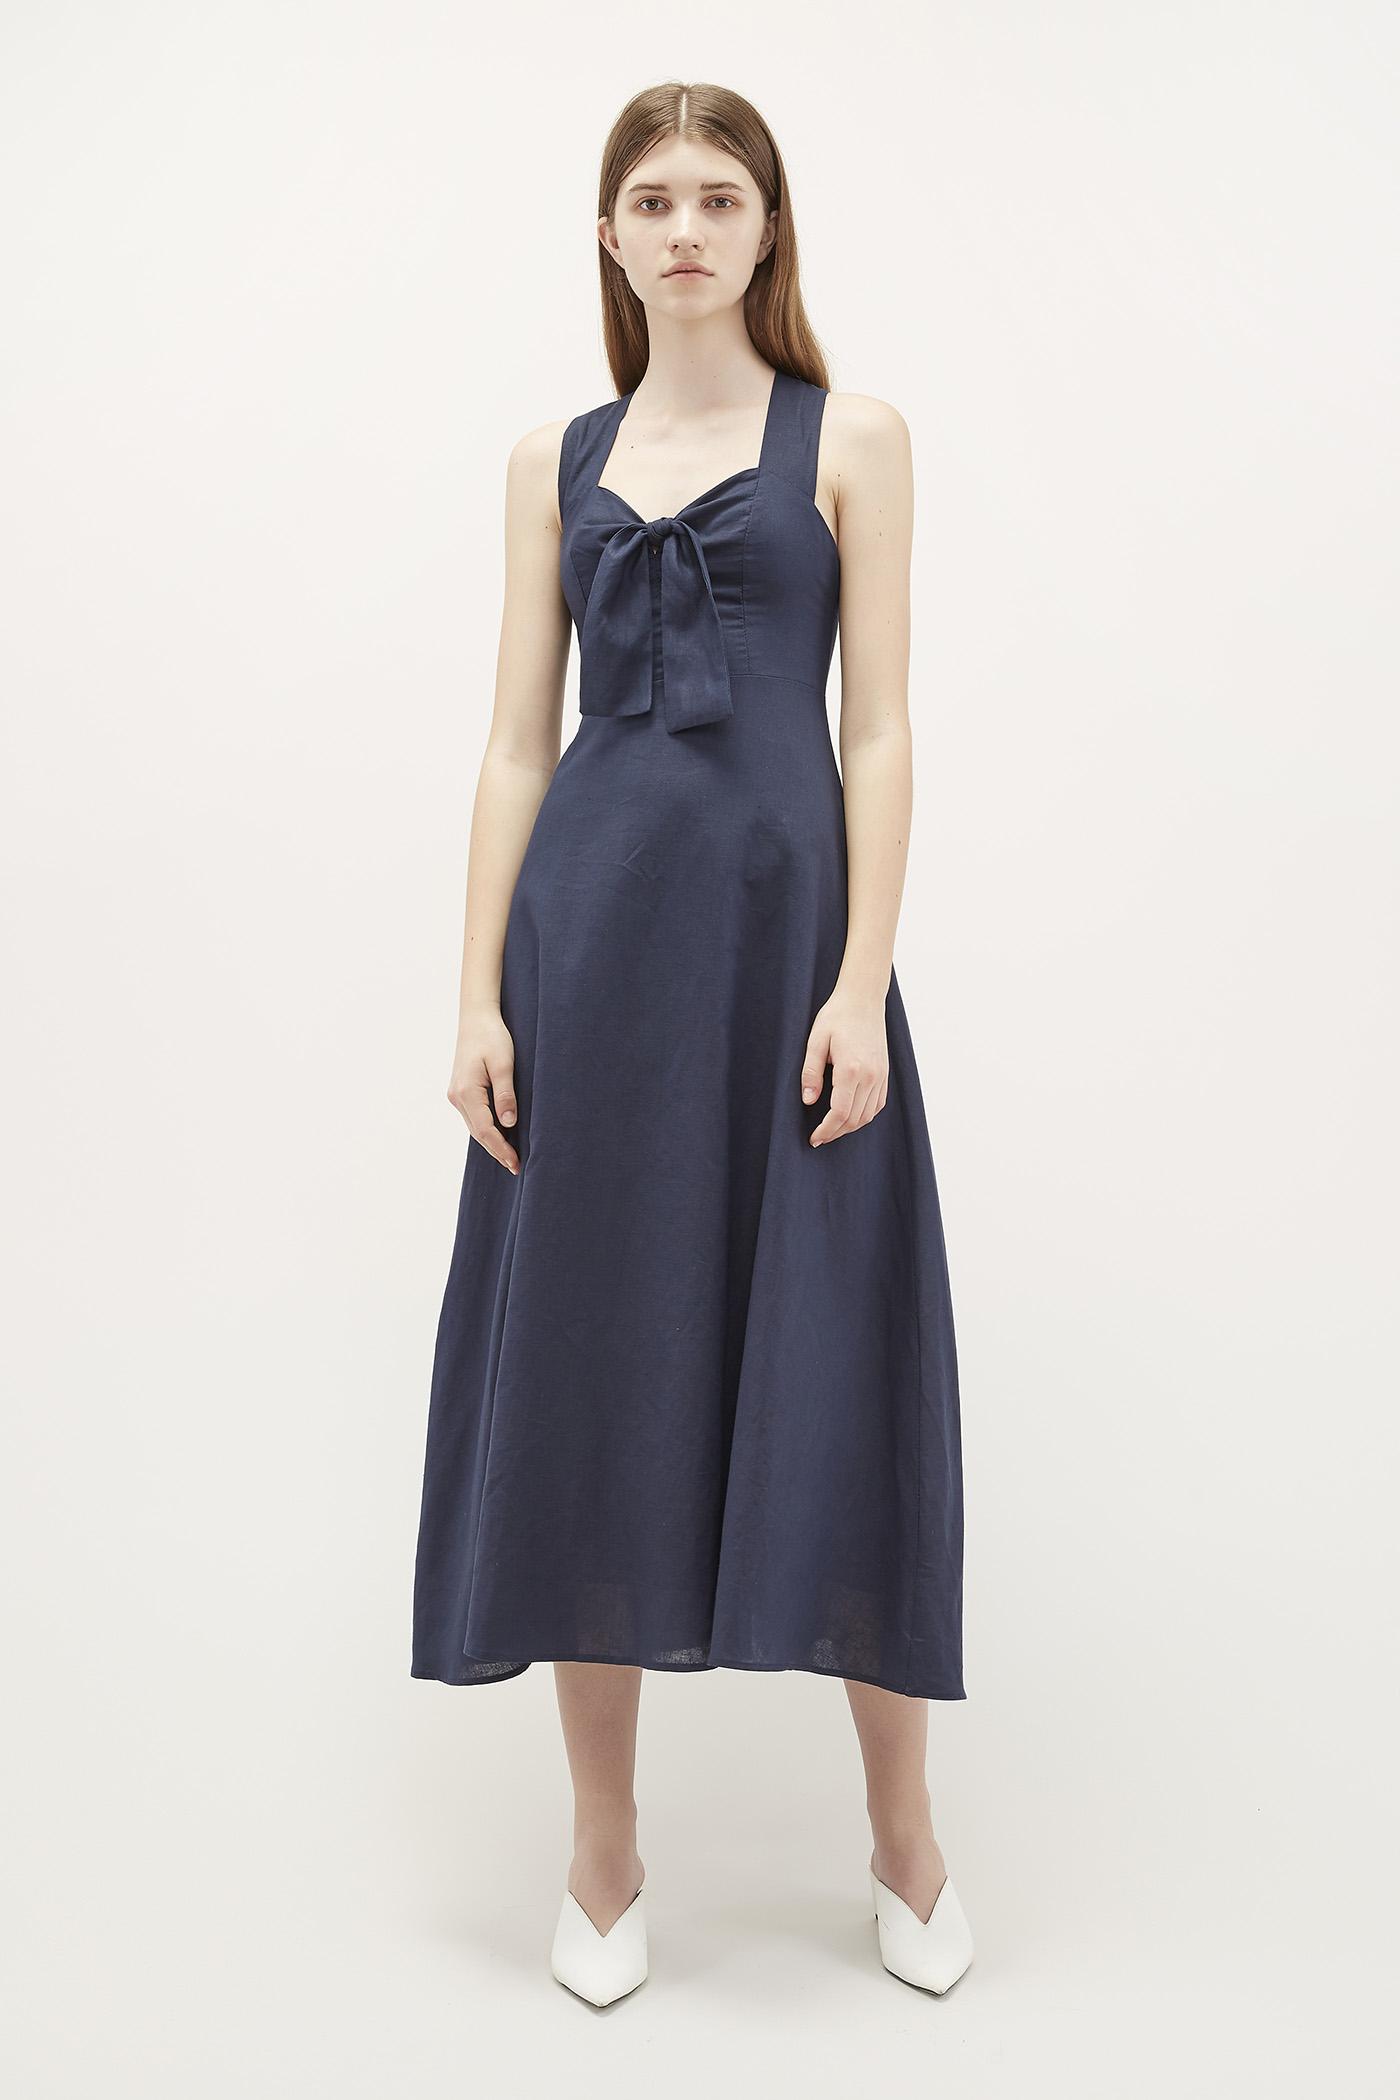 dc4bdd693d8b Dresses